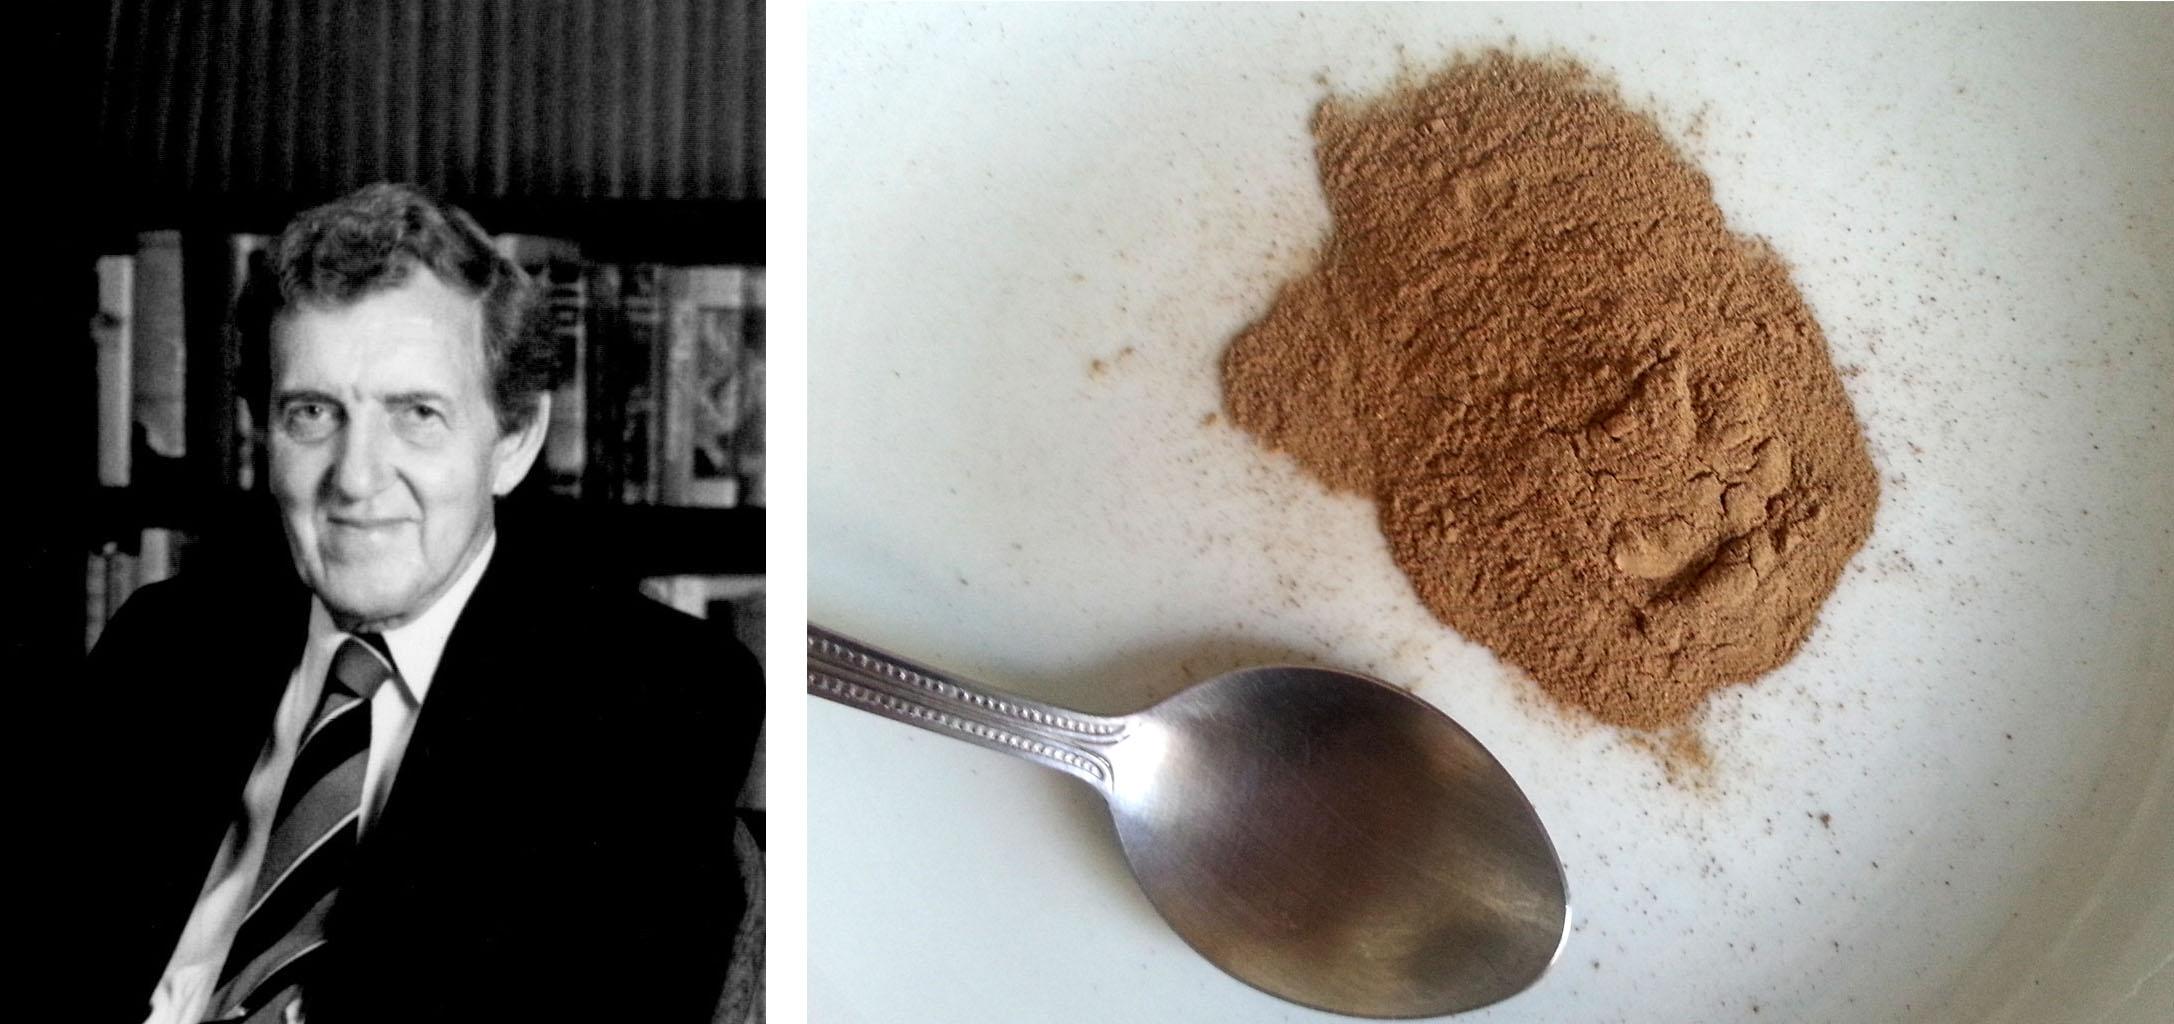 2_Hunter S Thompson Presidential Candidate Drug Addiction